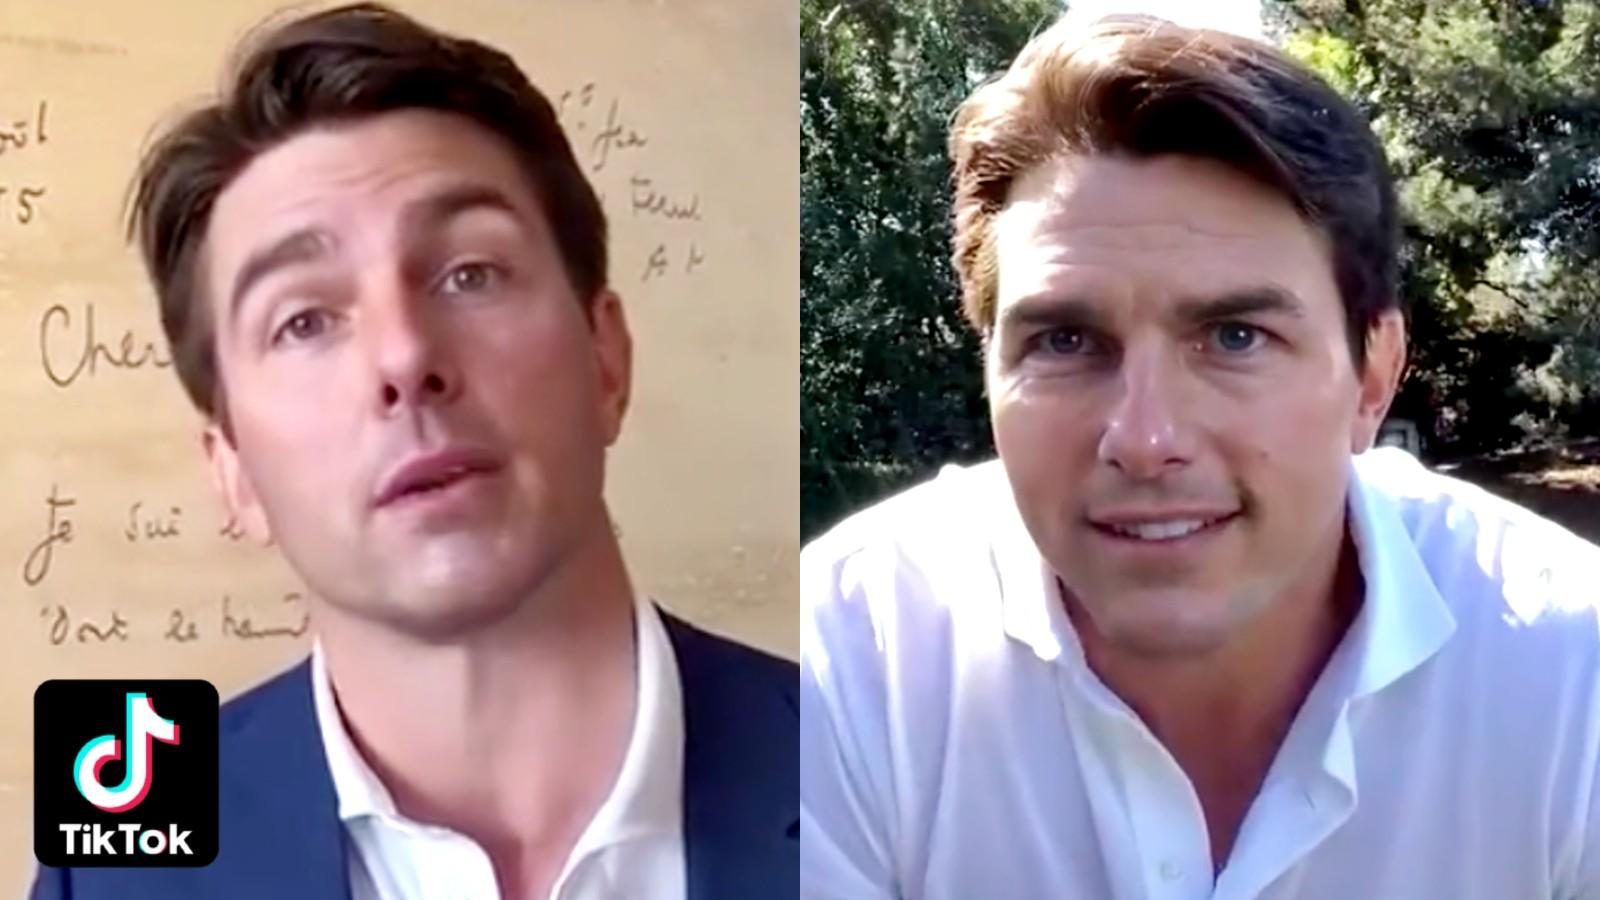 Viral Tom Cruise deepfake screenshots side by side